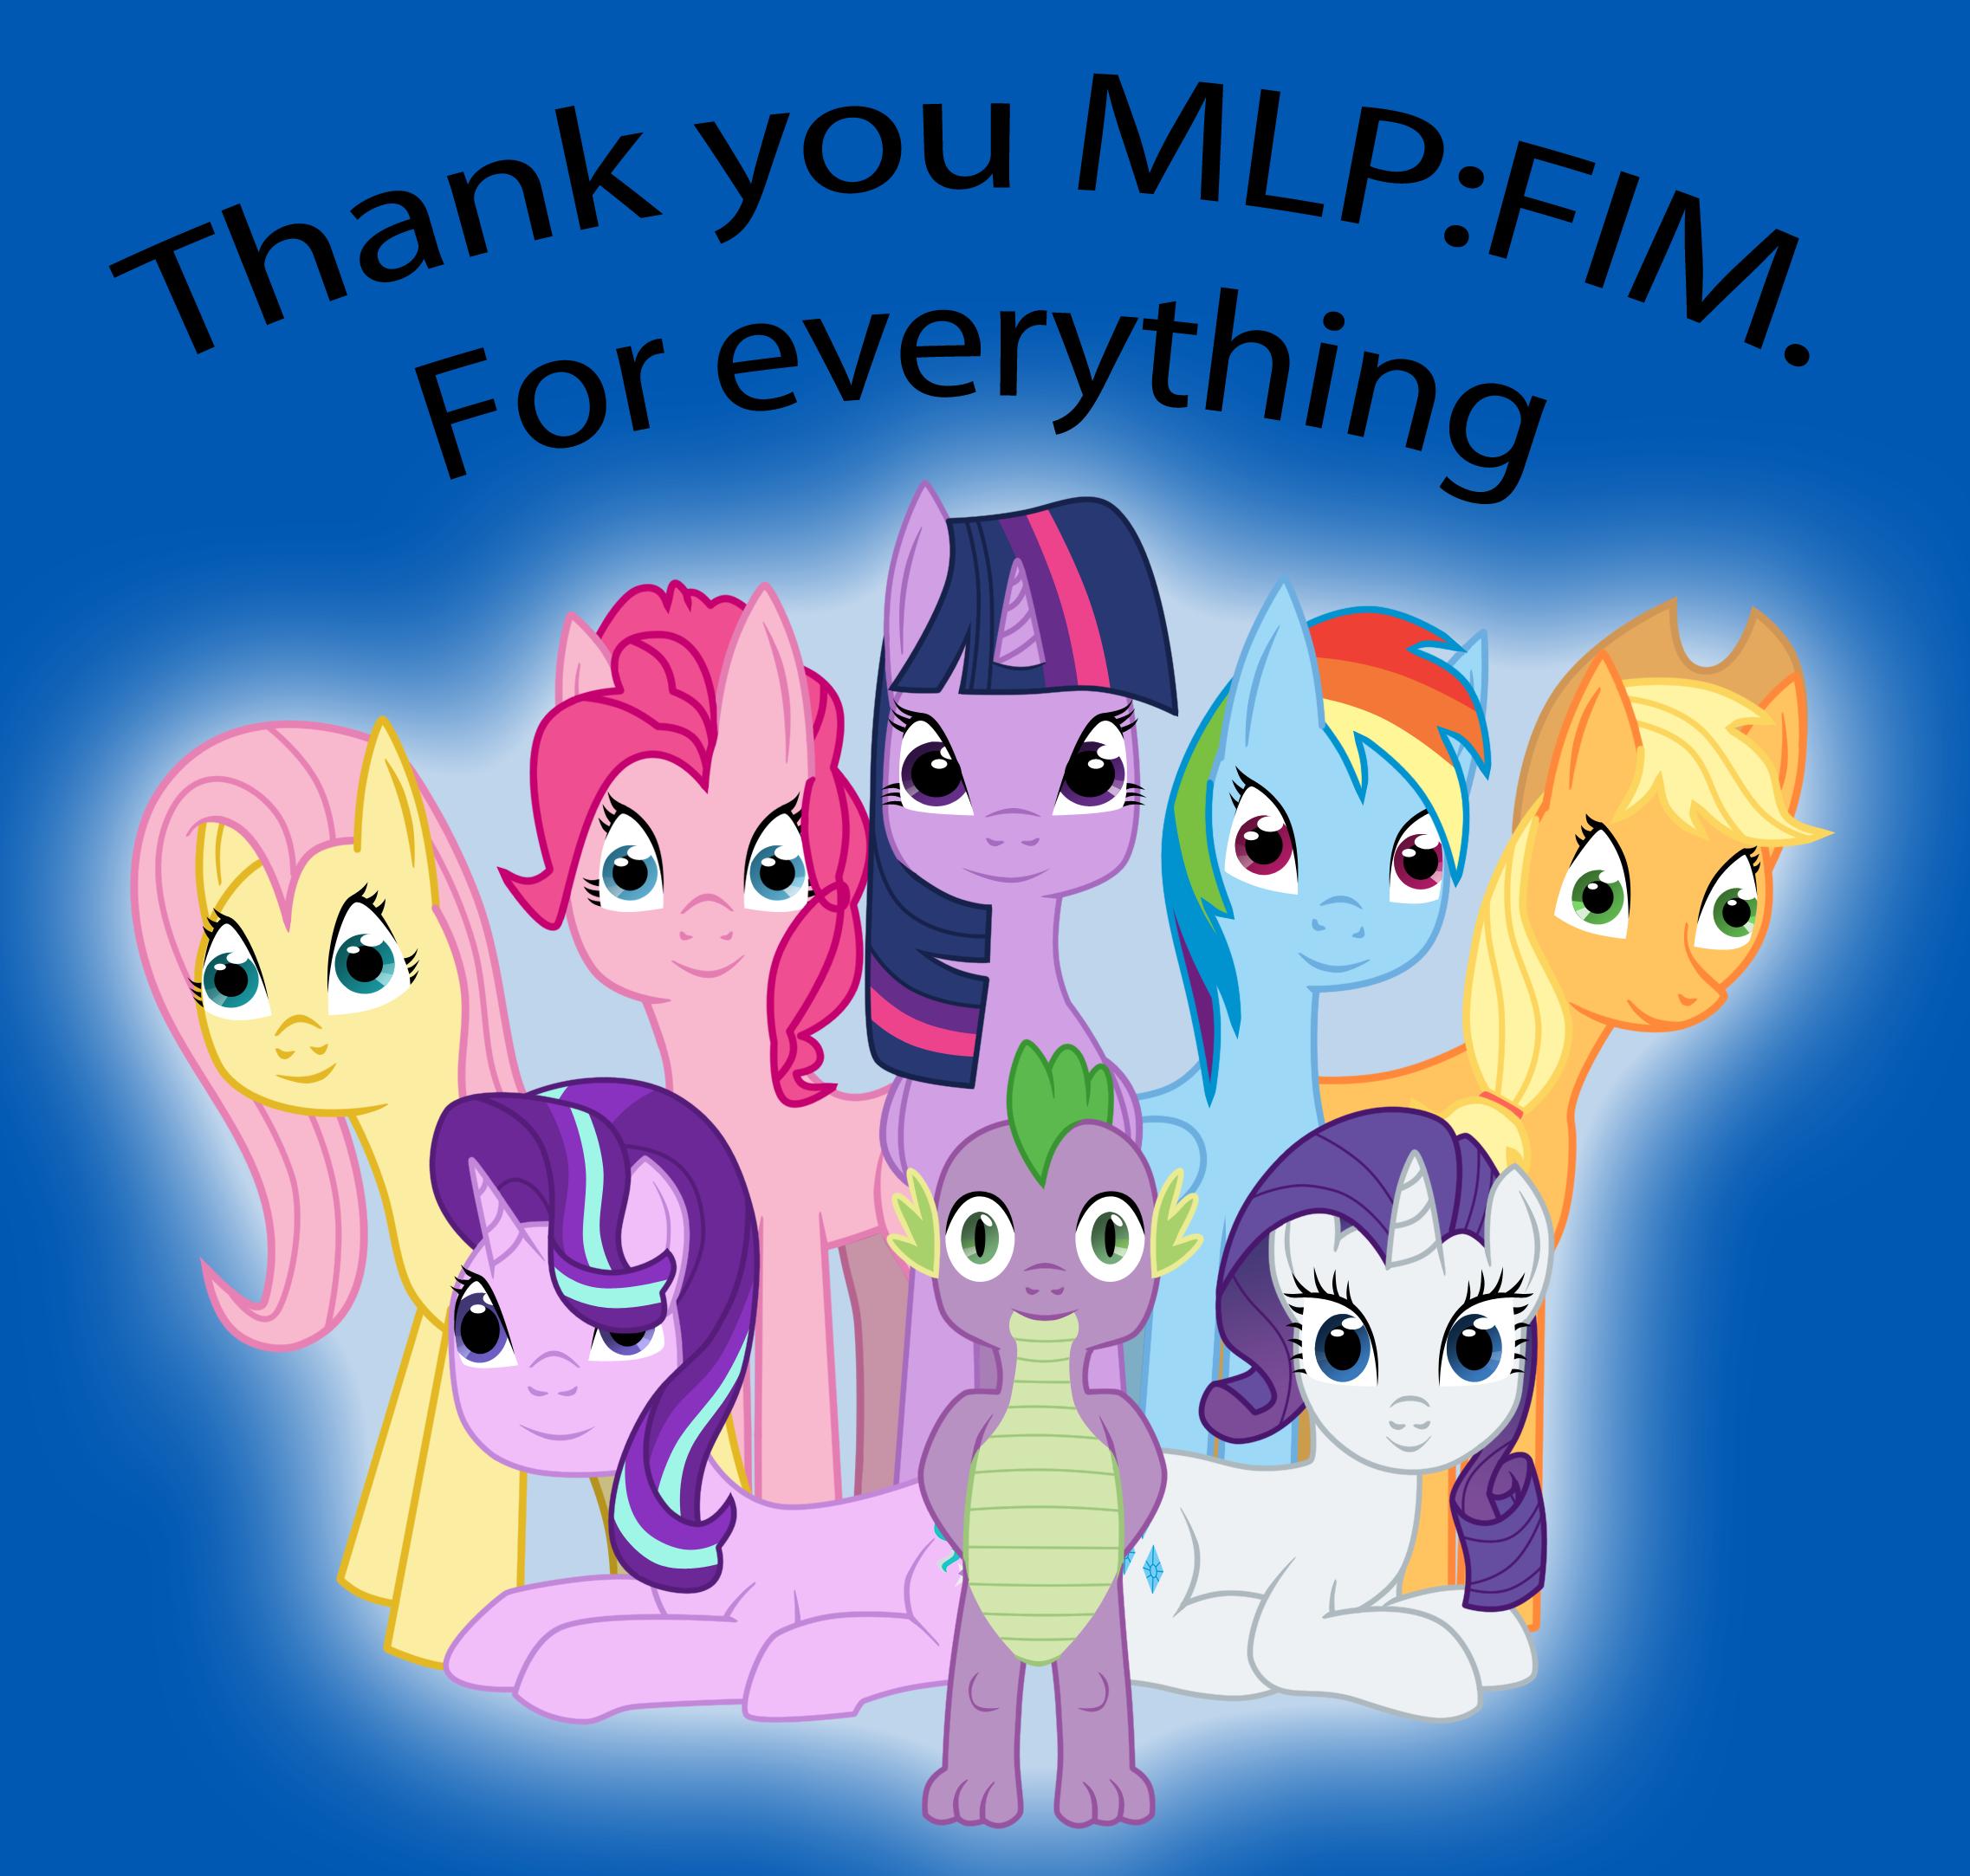 Thank you MLPFIS